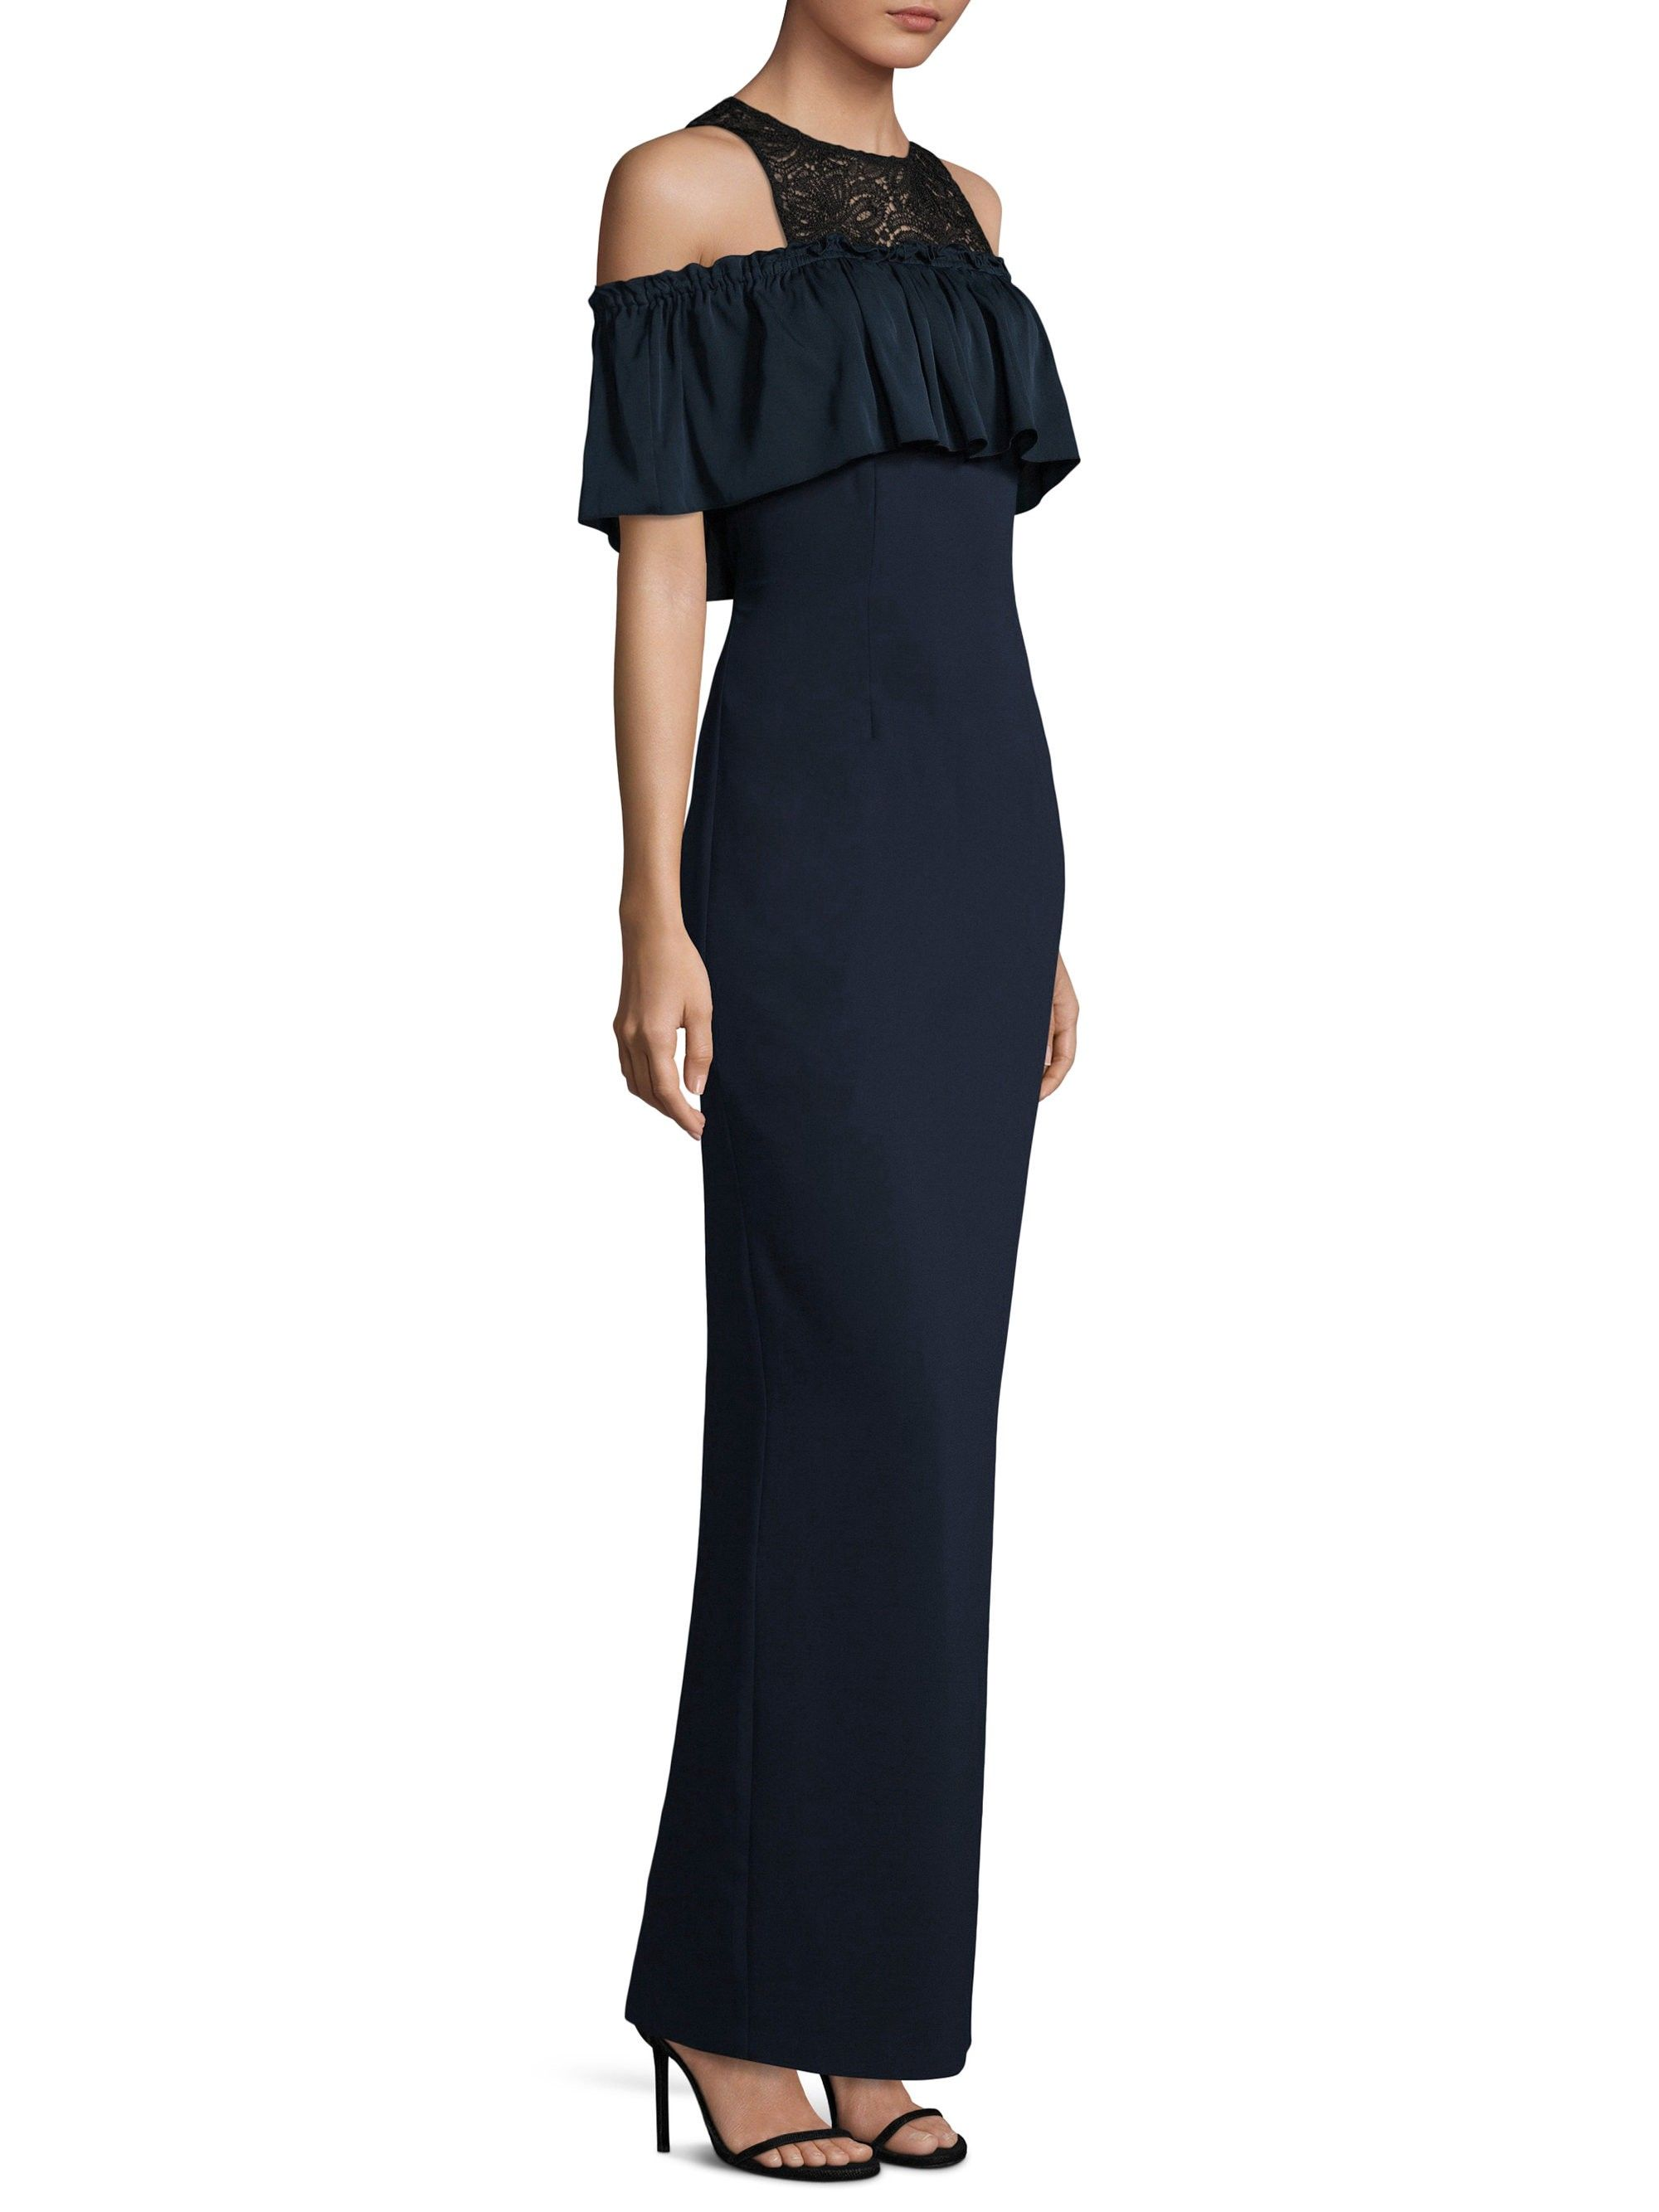 Trina Turk Lauren Cold Shoulder Ruffle Dress Indigo 14 Women S Evening Dresses Black Women Dress Trina Turk Dresses [ 2667 x 2000 Pixel ]